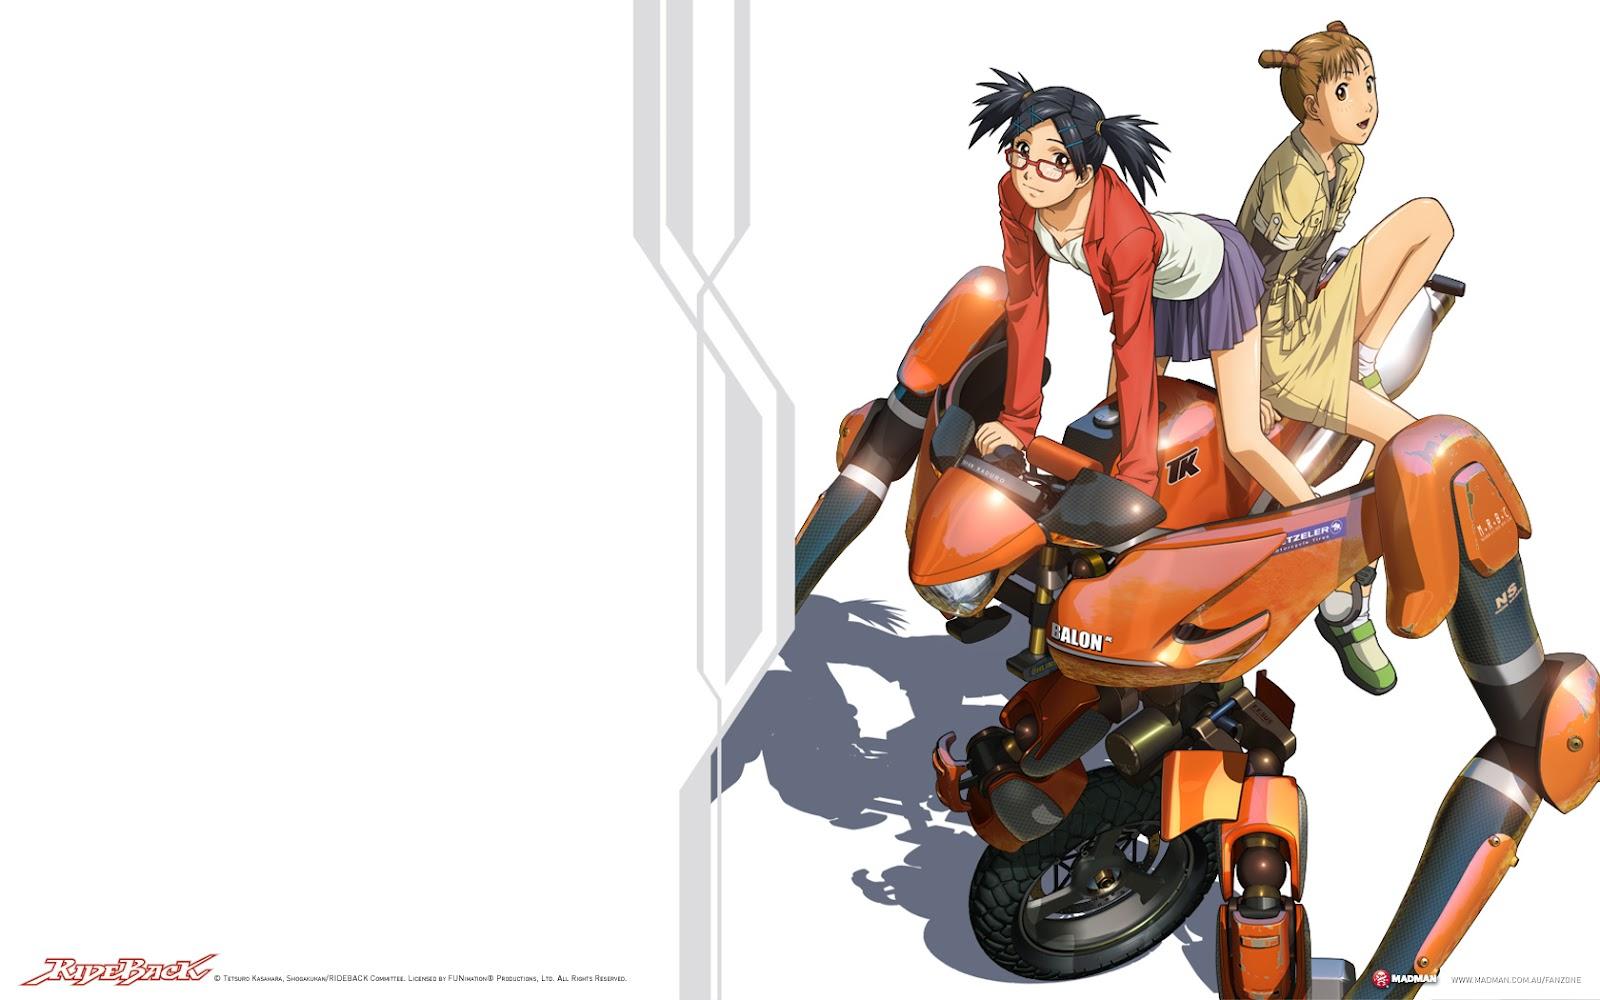 rideback_655_1680.jpg